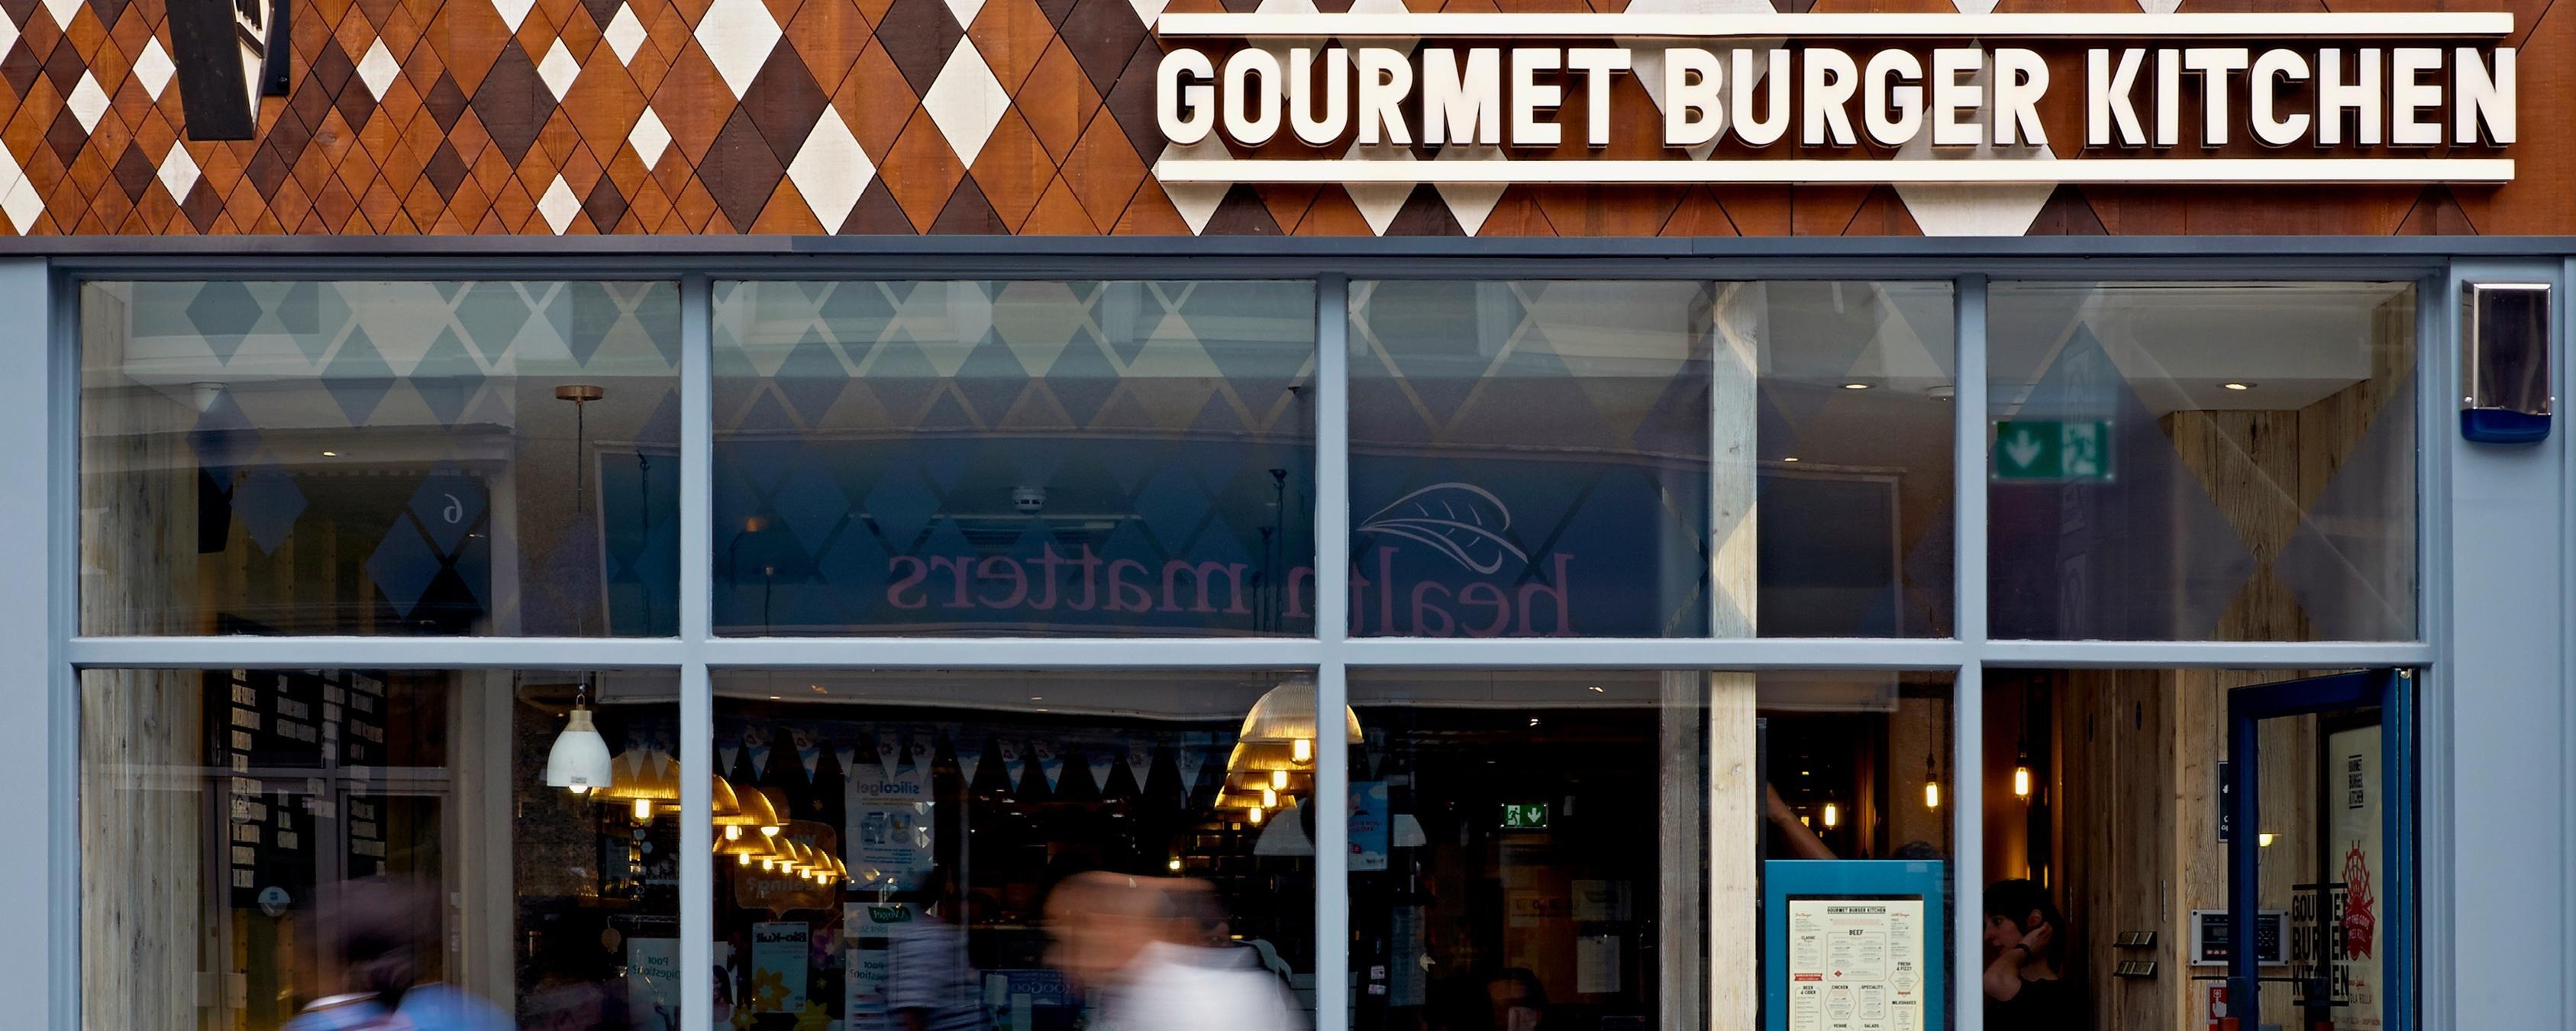 Gourmet Burger Kitchen Brand Cover